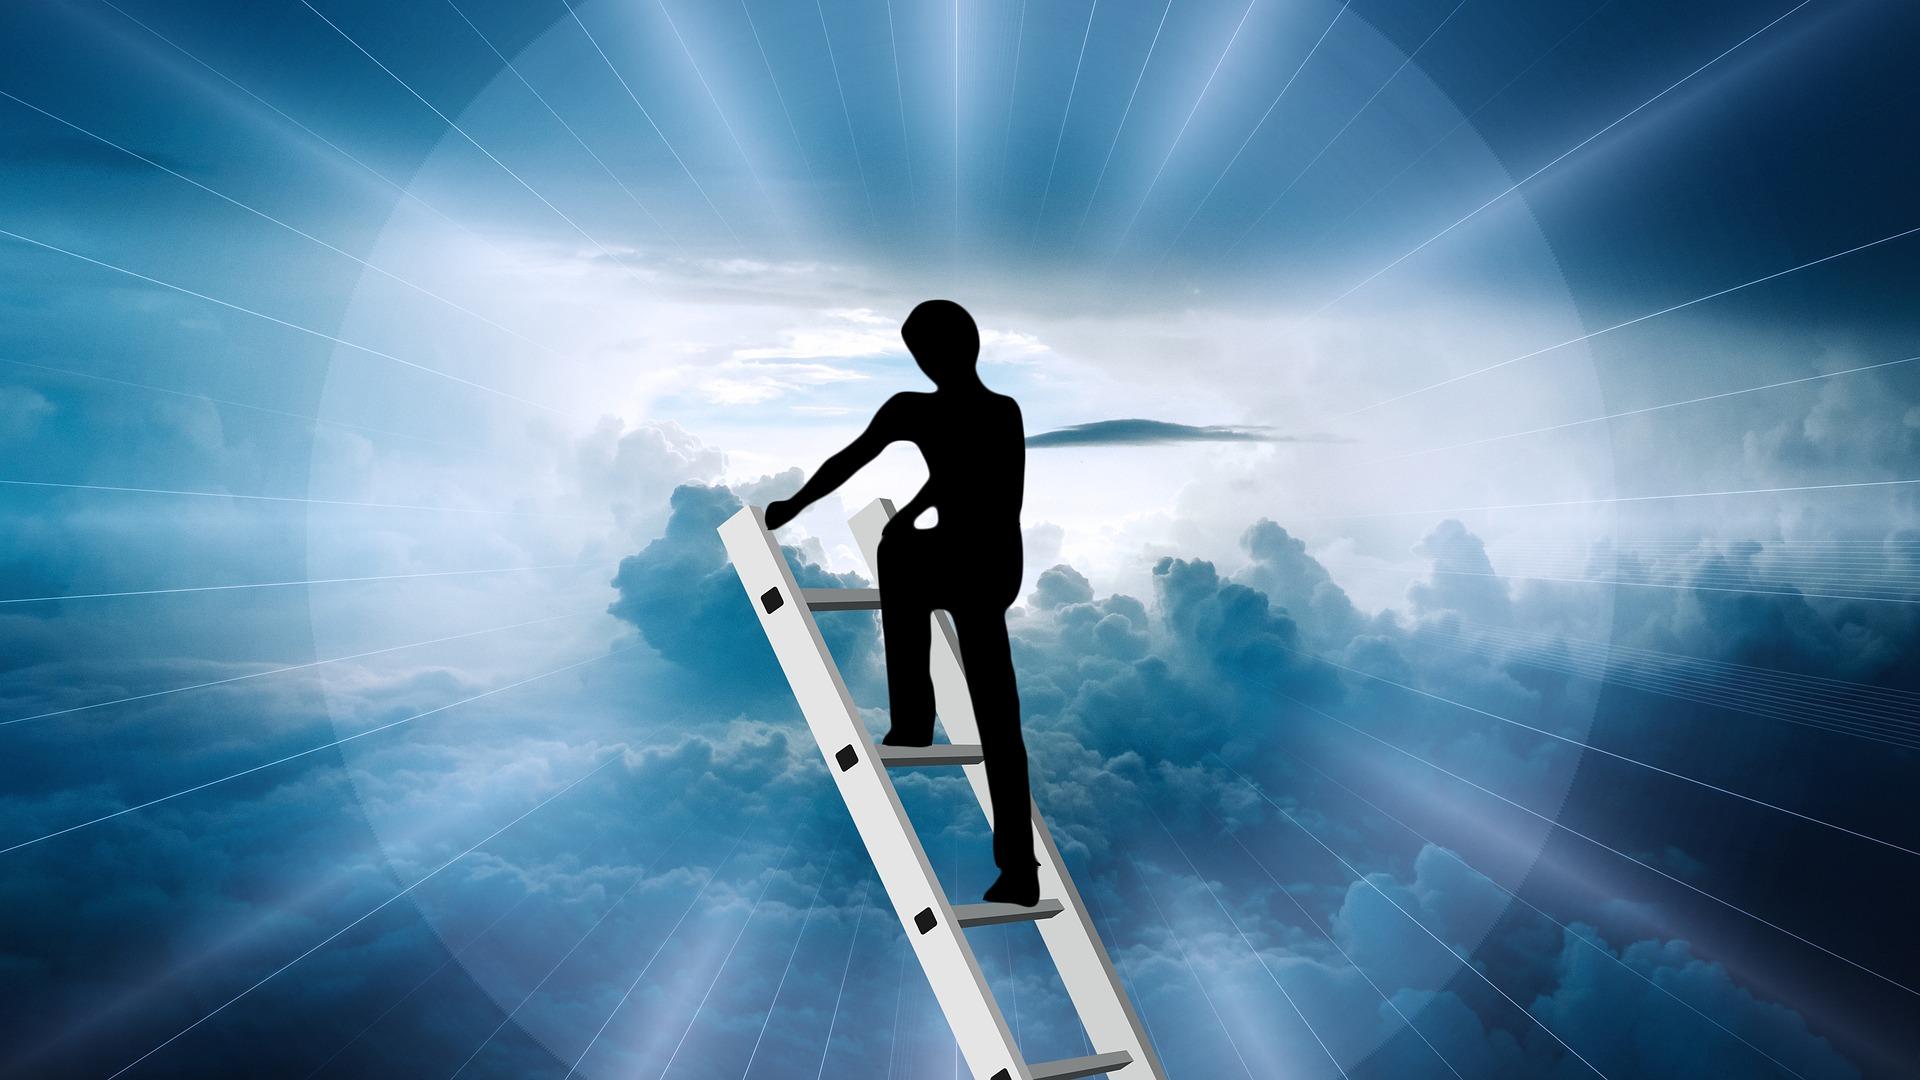 Silhouette climbing ladder to sunlight